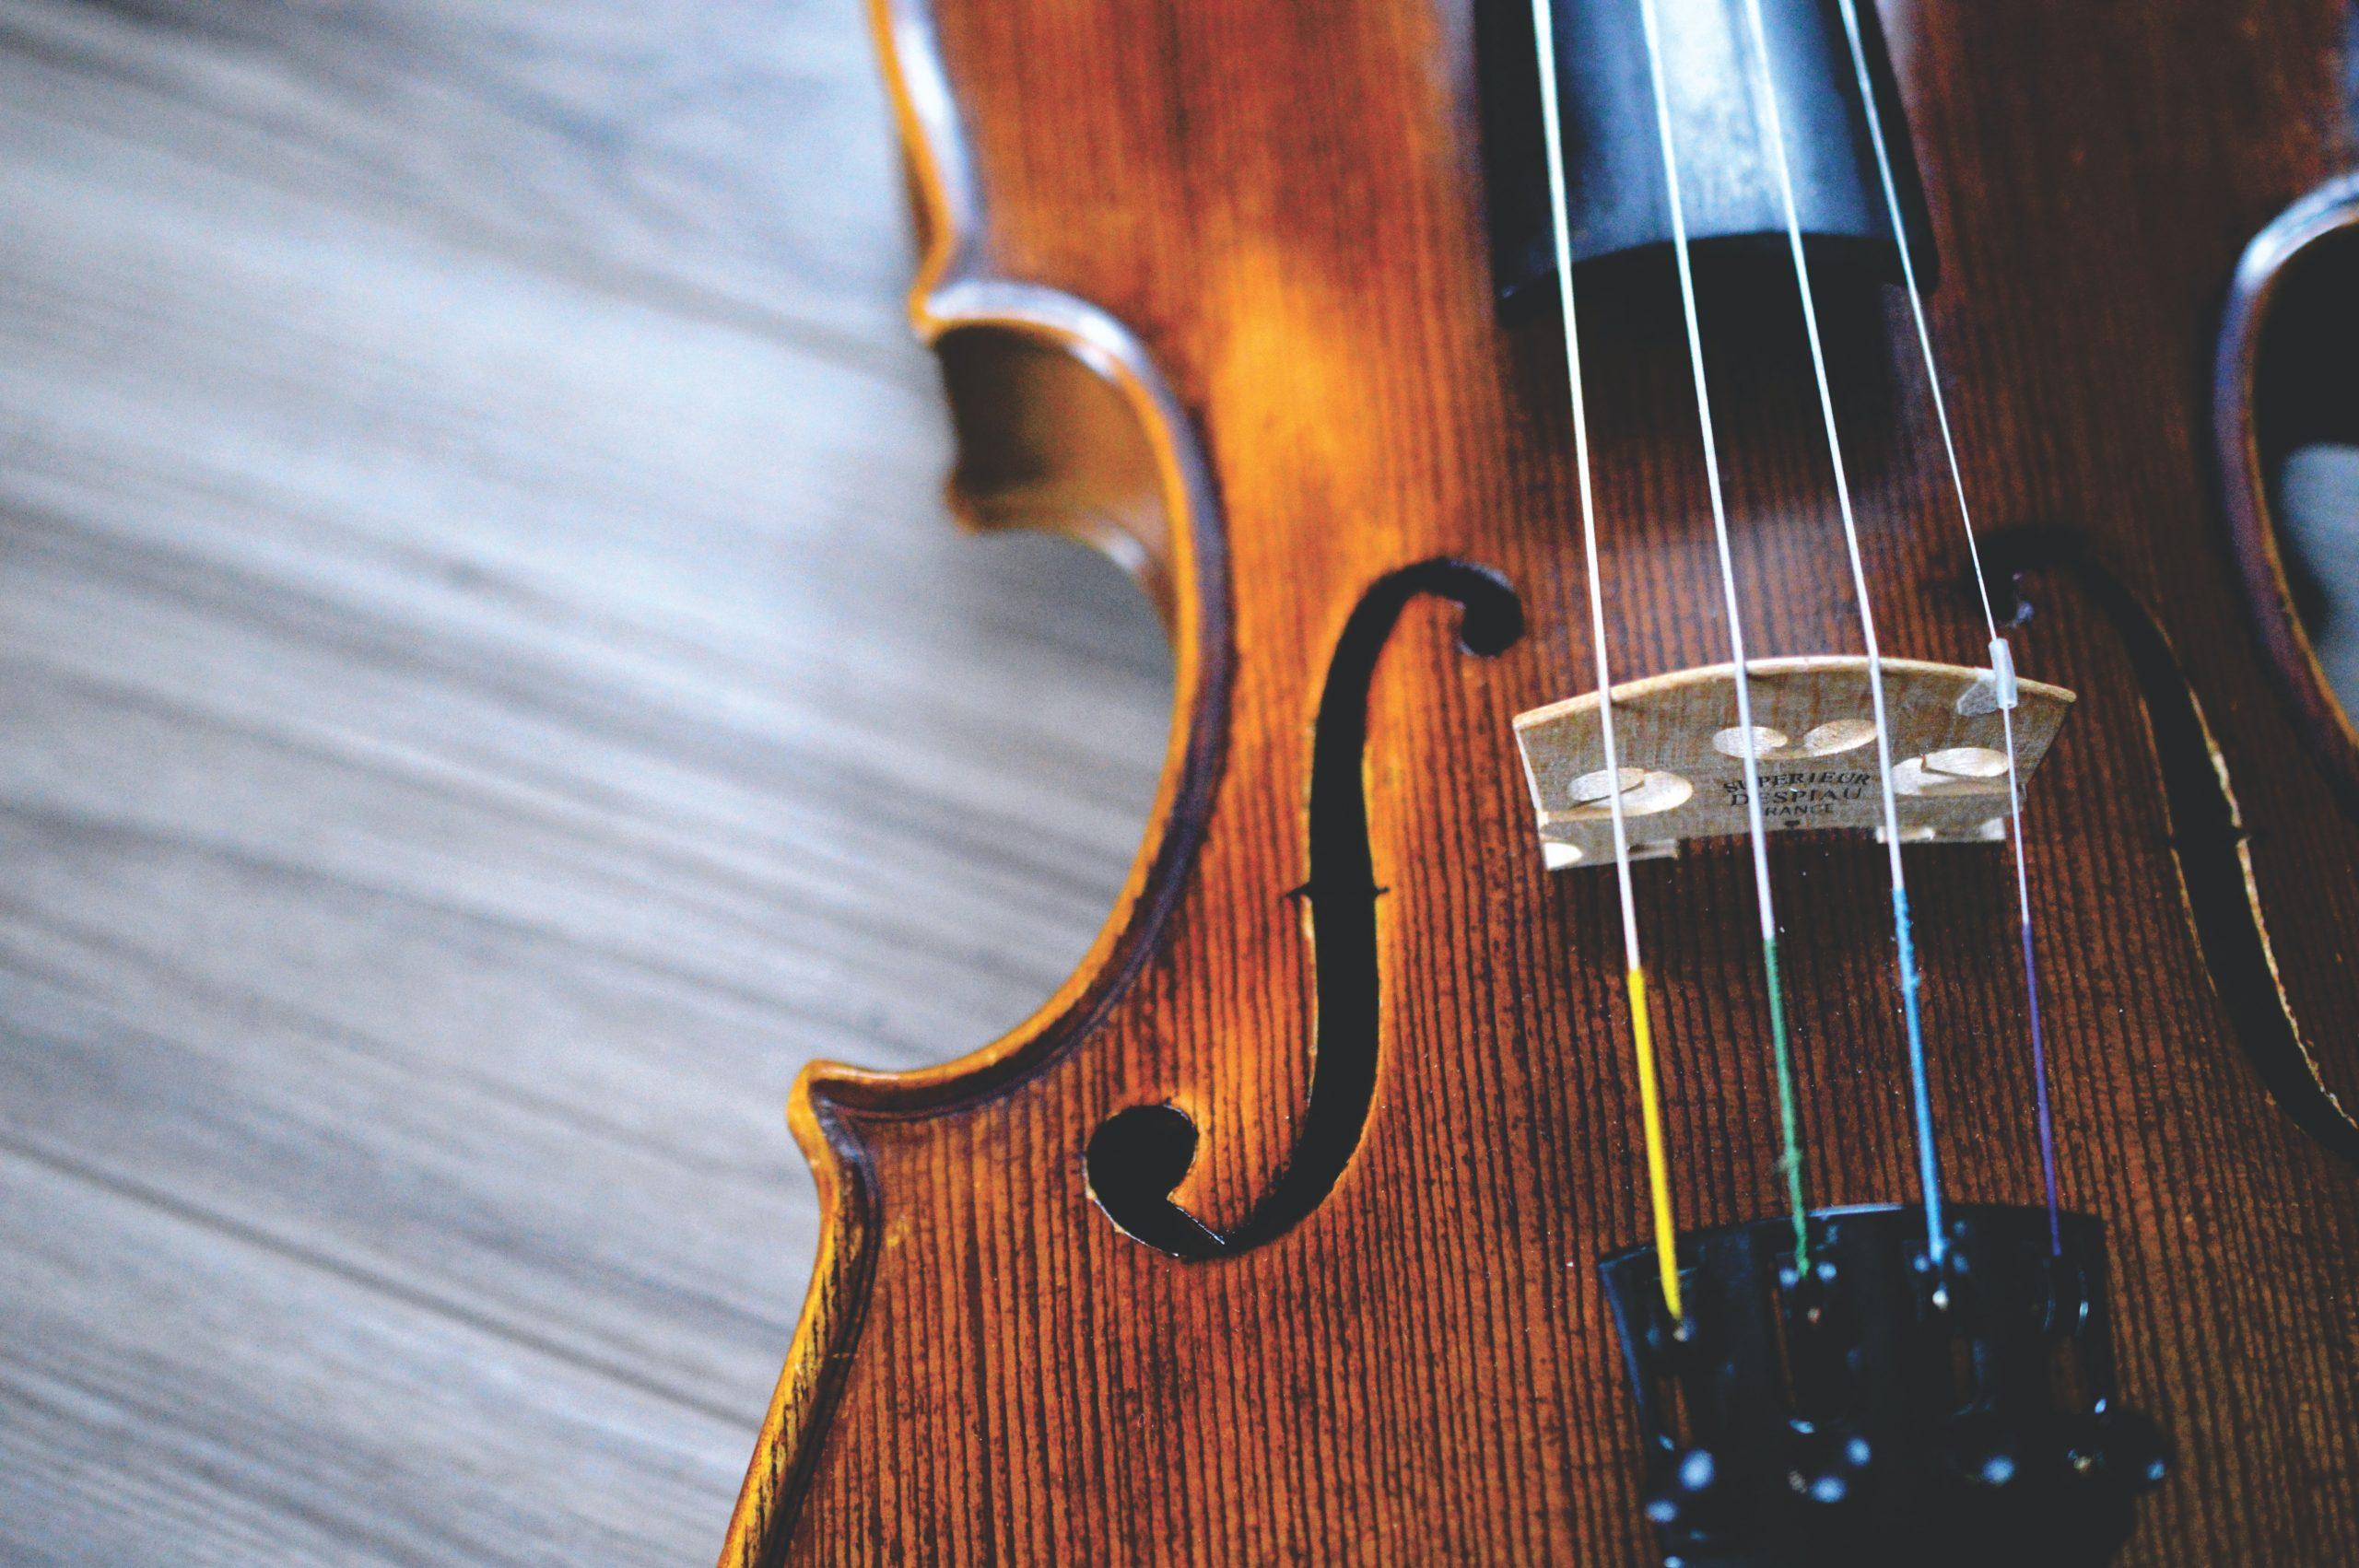 Violin strings in close-up